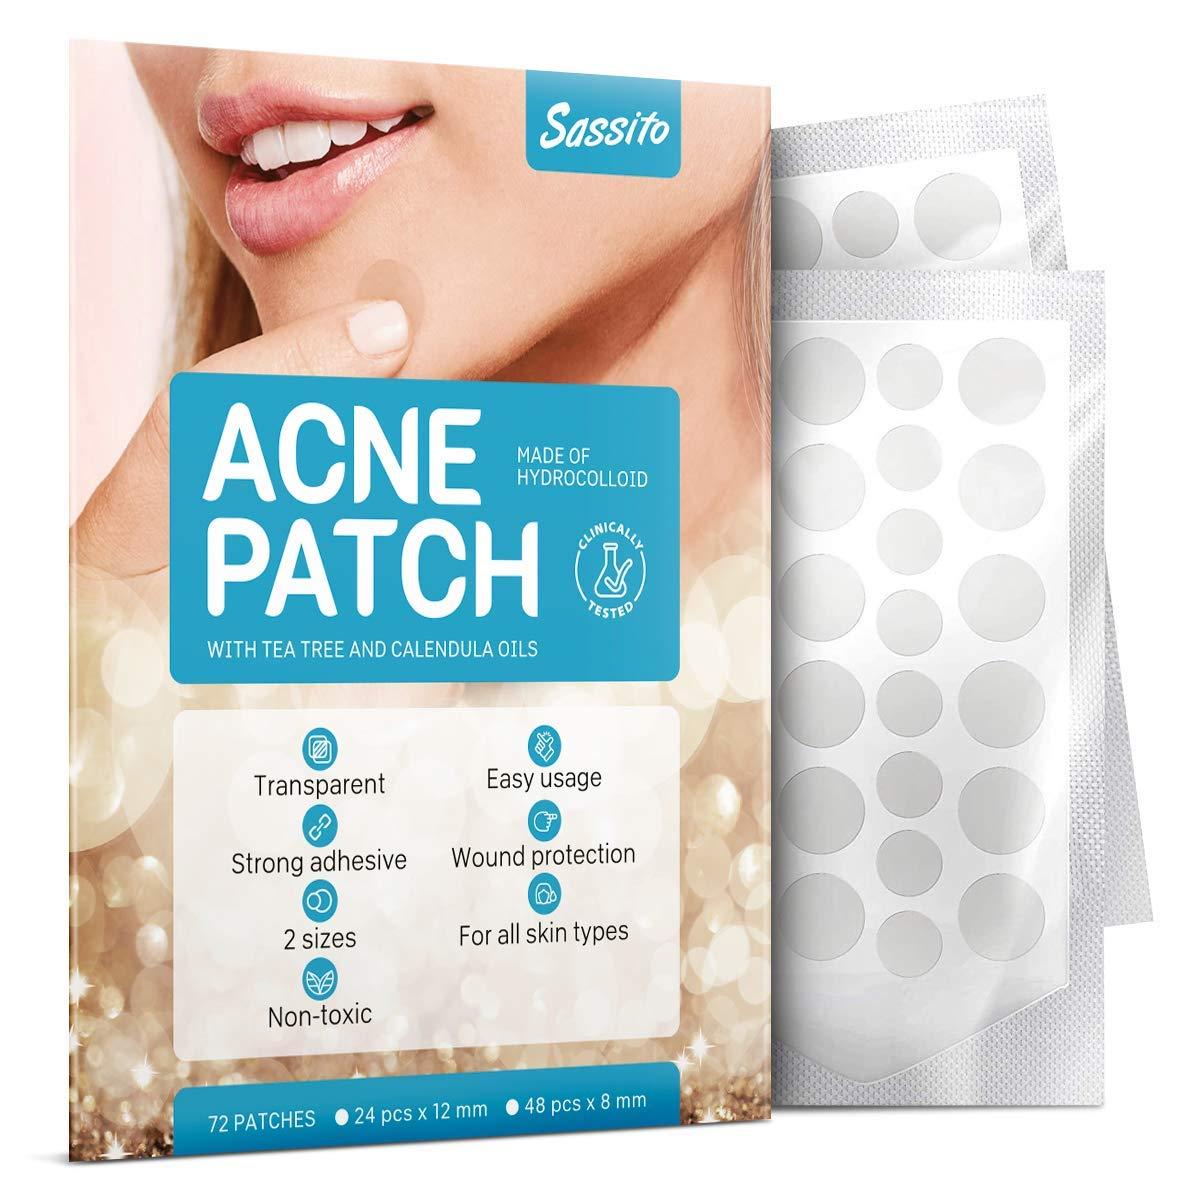 Best Pimple Patches